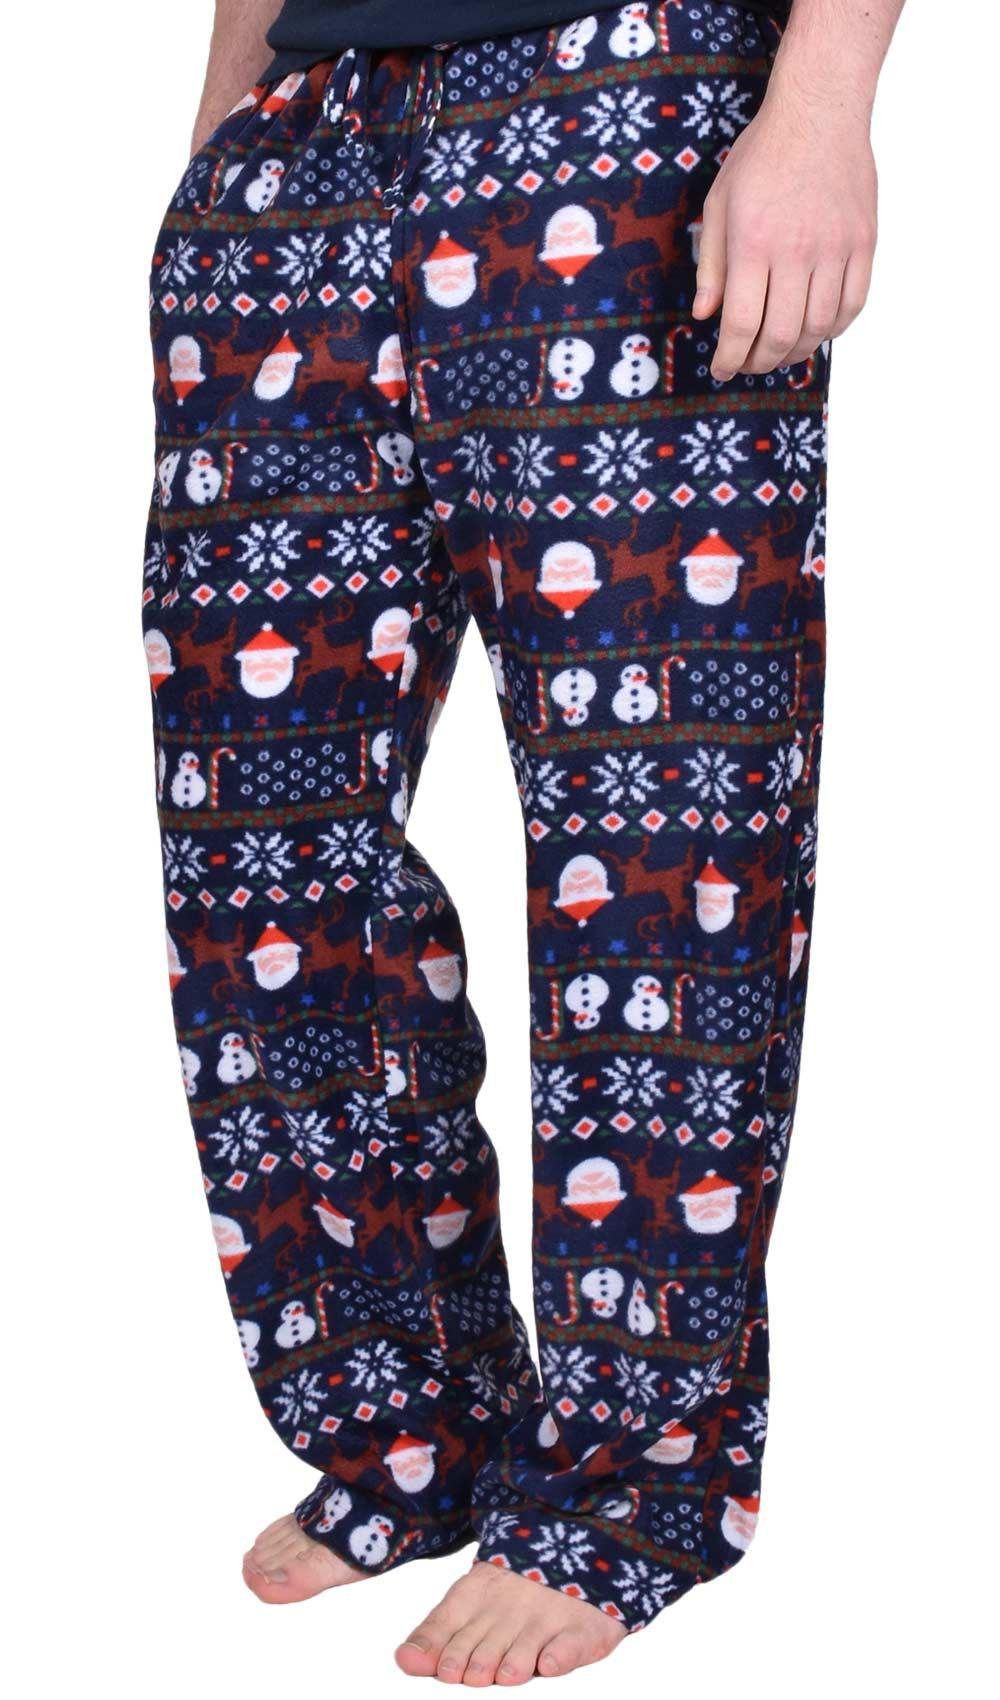 Mens-Women-Plain-Fleece-Joggers-Bottoms-Jogging-Pant-Gym-Fitness-Sports-Trousers thumbnail 27